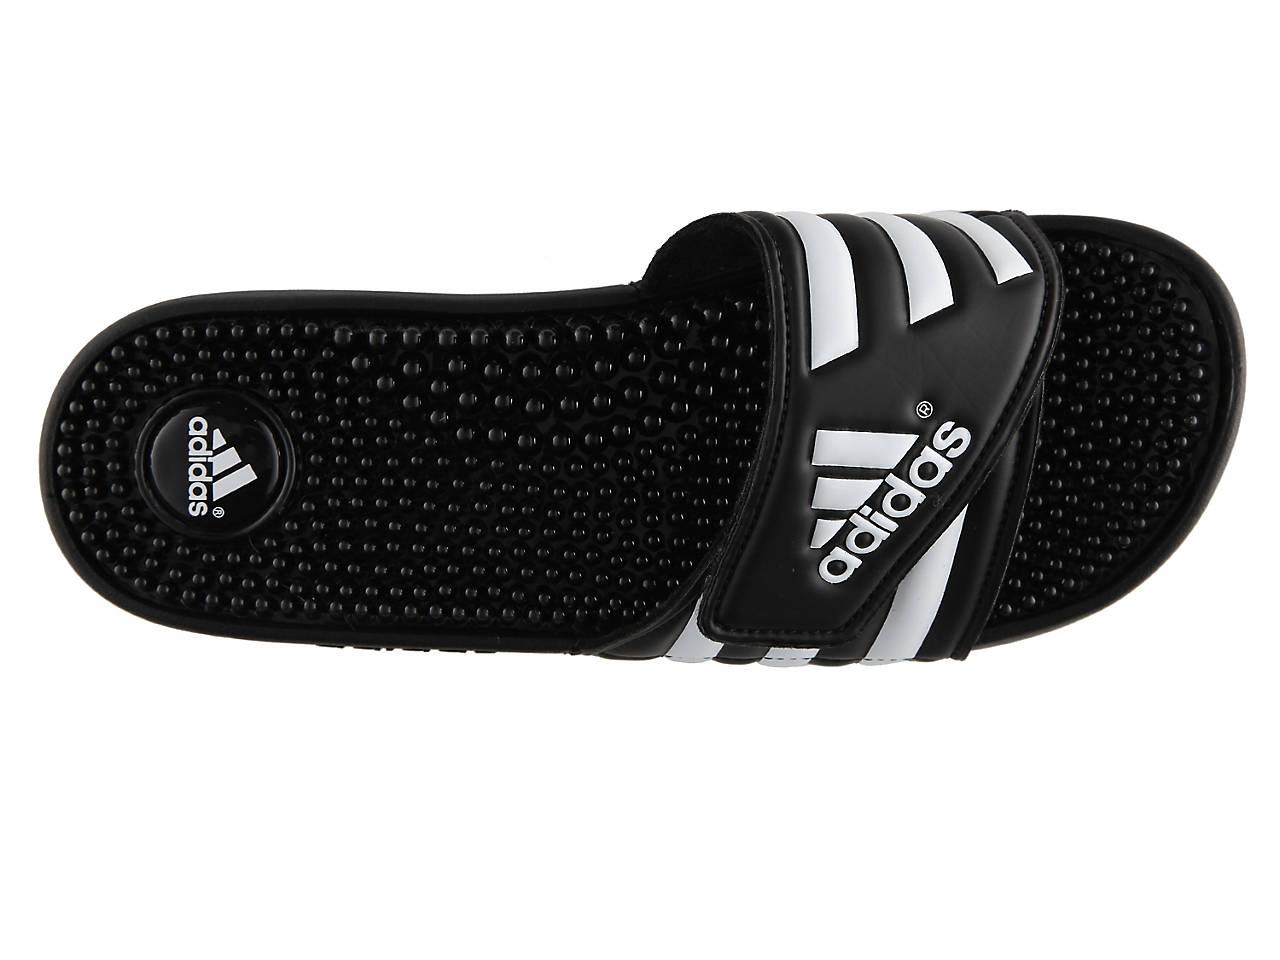 6e1cb4ee6 adidas Adissage Slide Sandal - Women s Women s Shoes